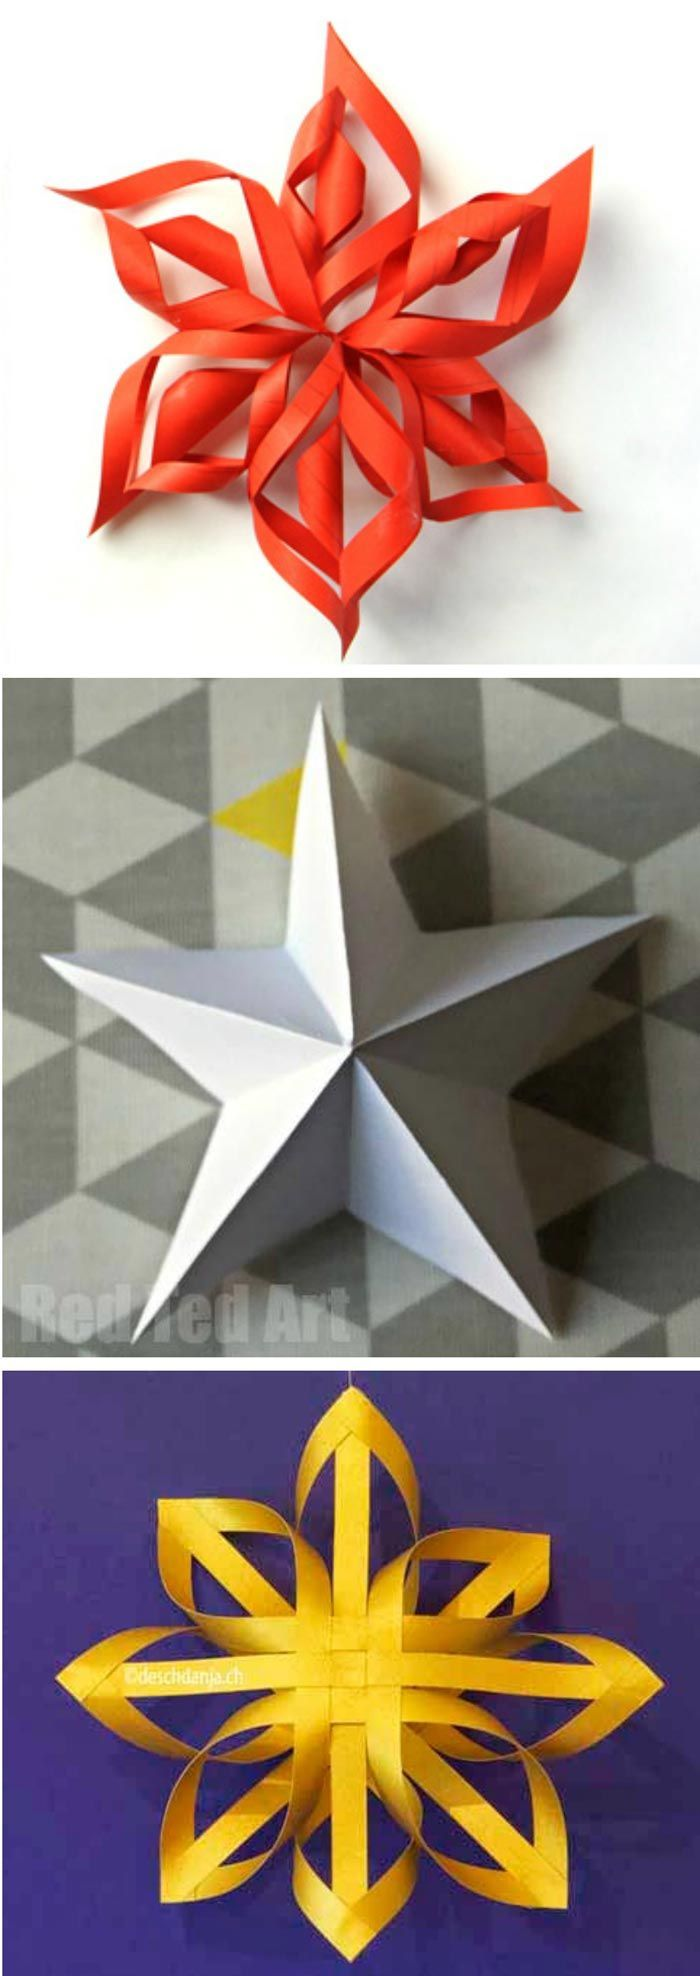 3 ways to make 3D Paper Stars